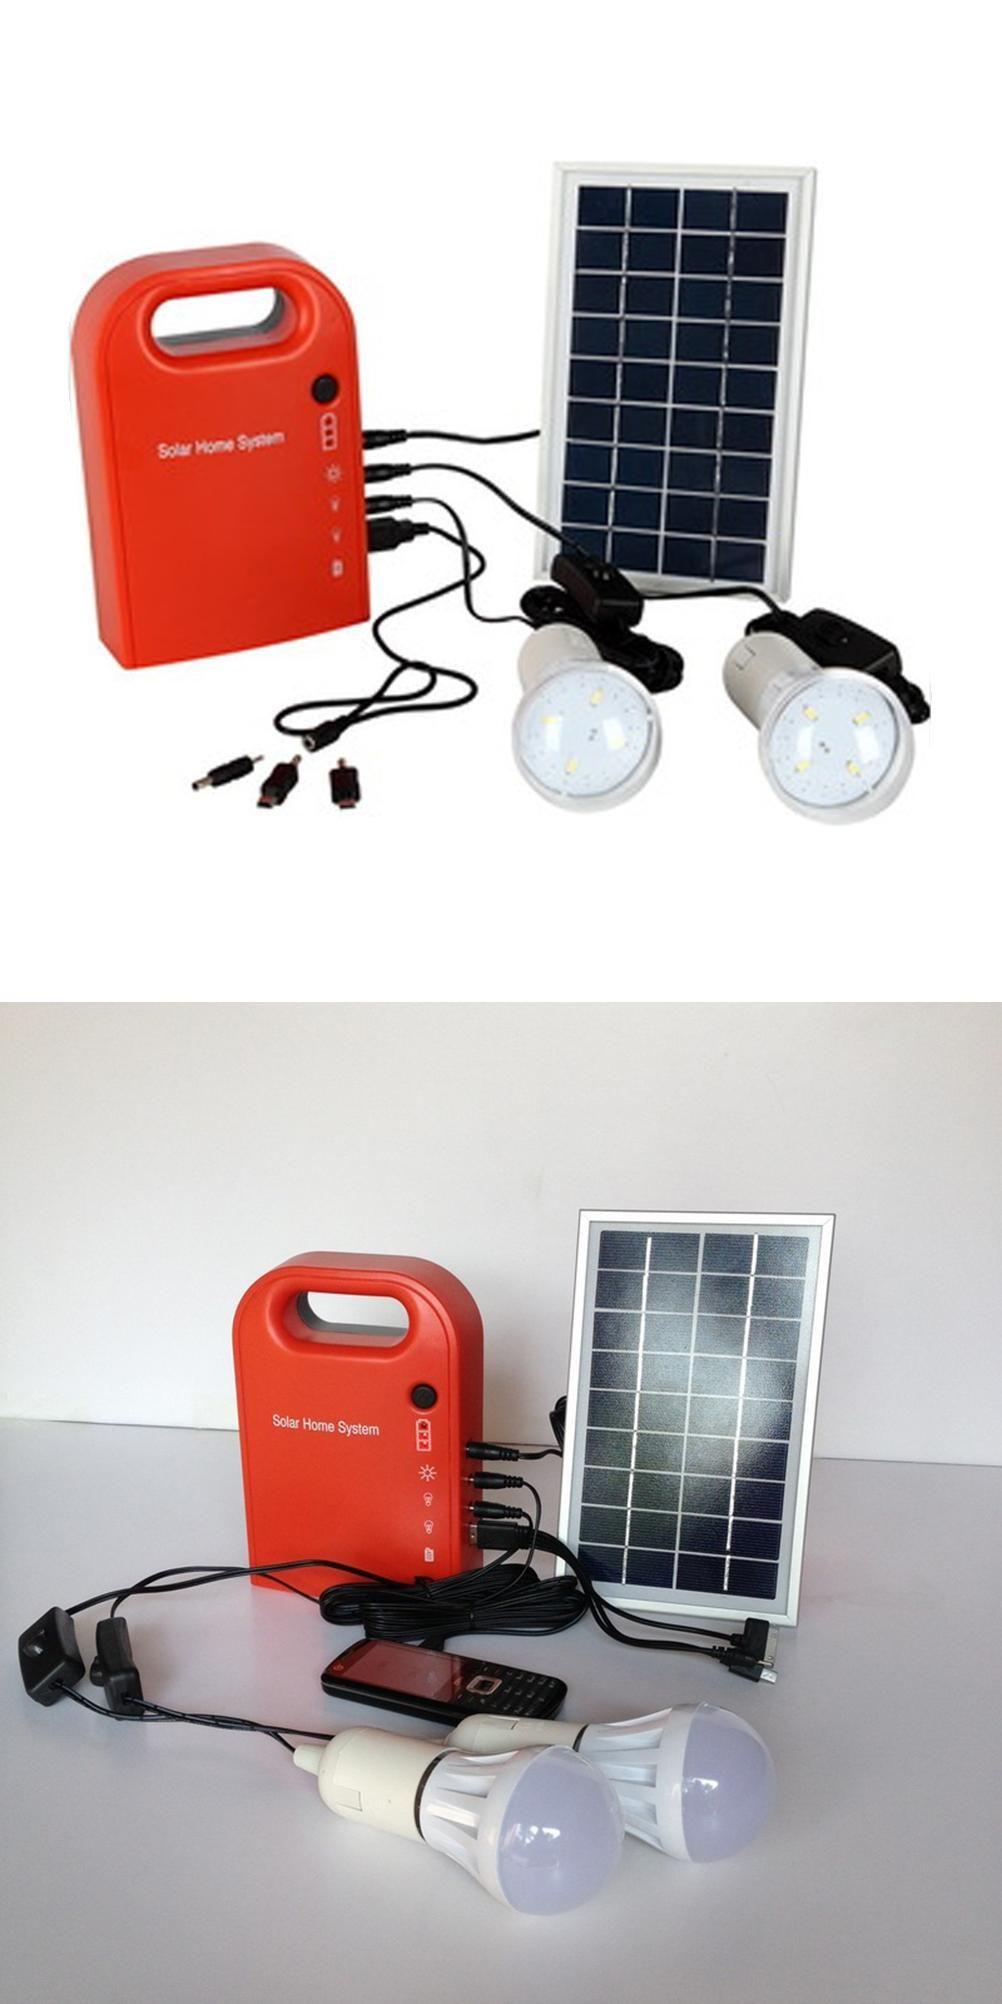 Visit to Buy] Led Solar Lamp Panels Powered Battery 6V 4 5Ah